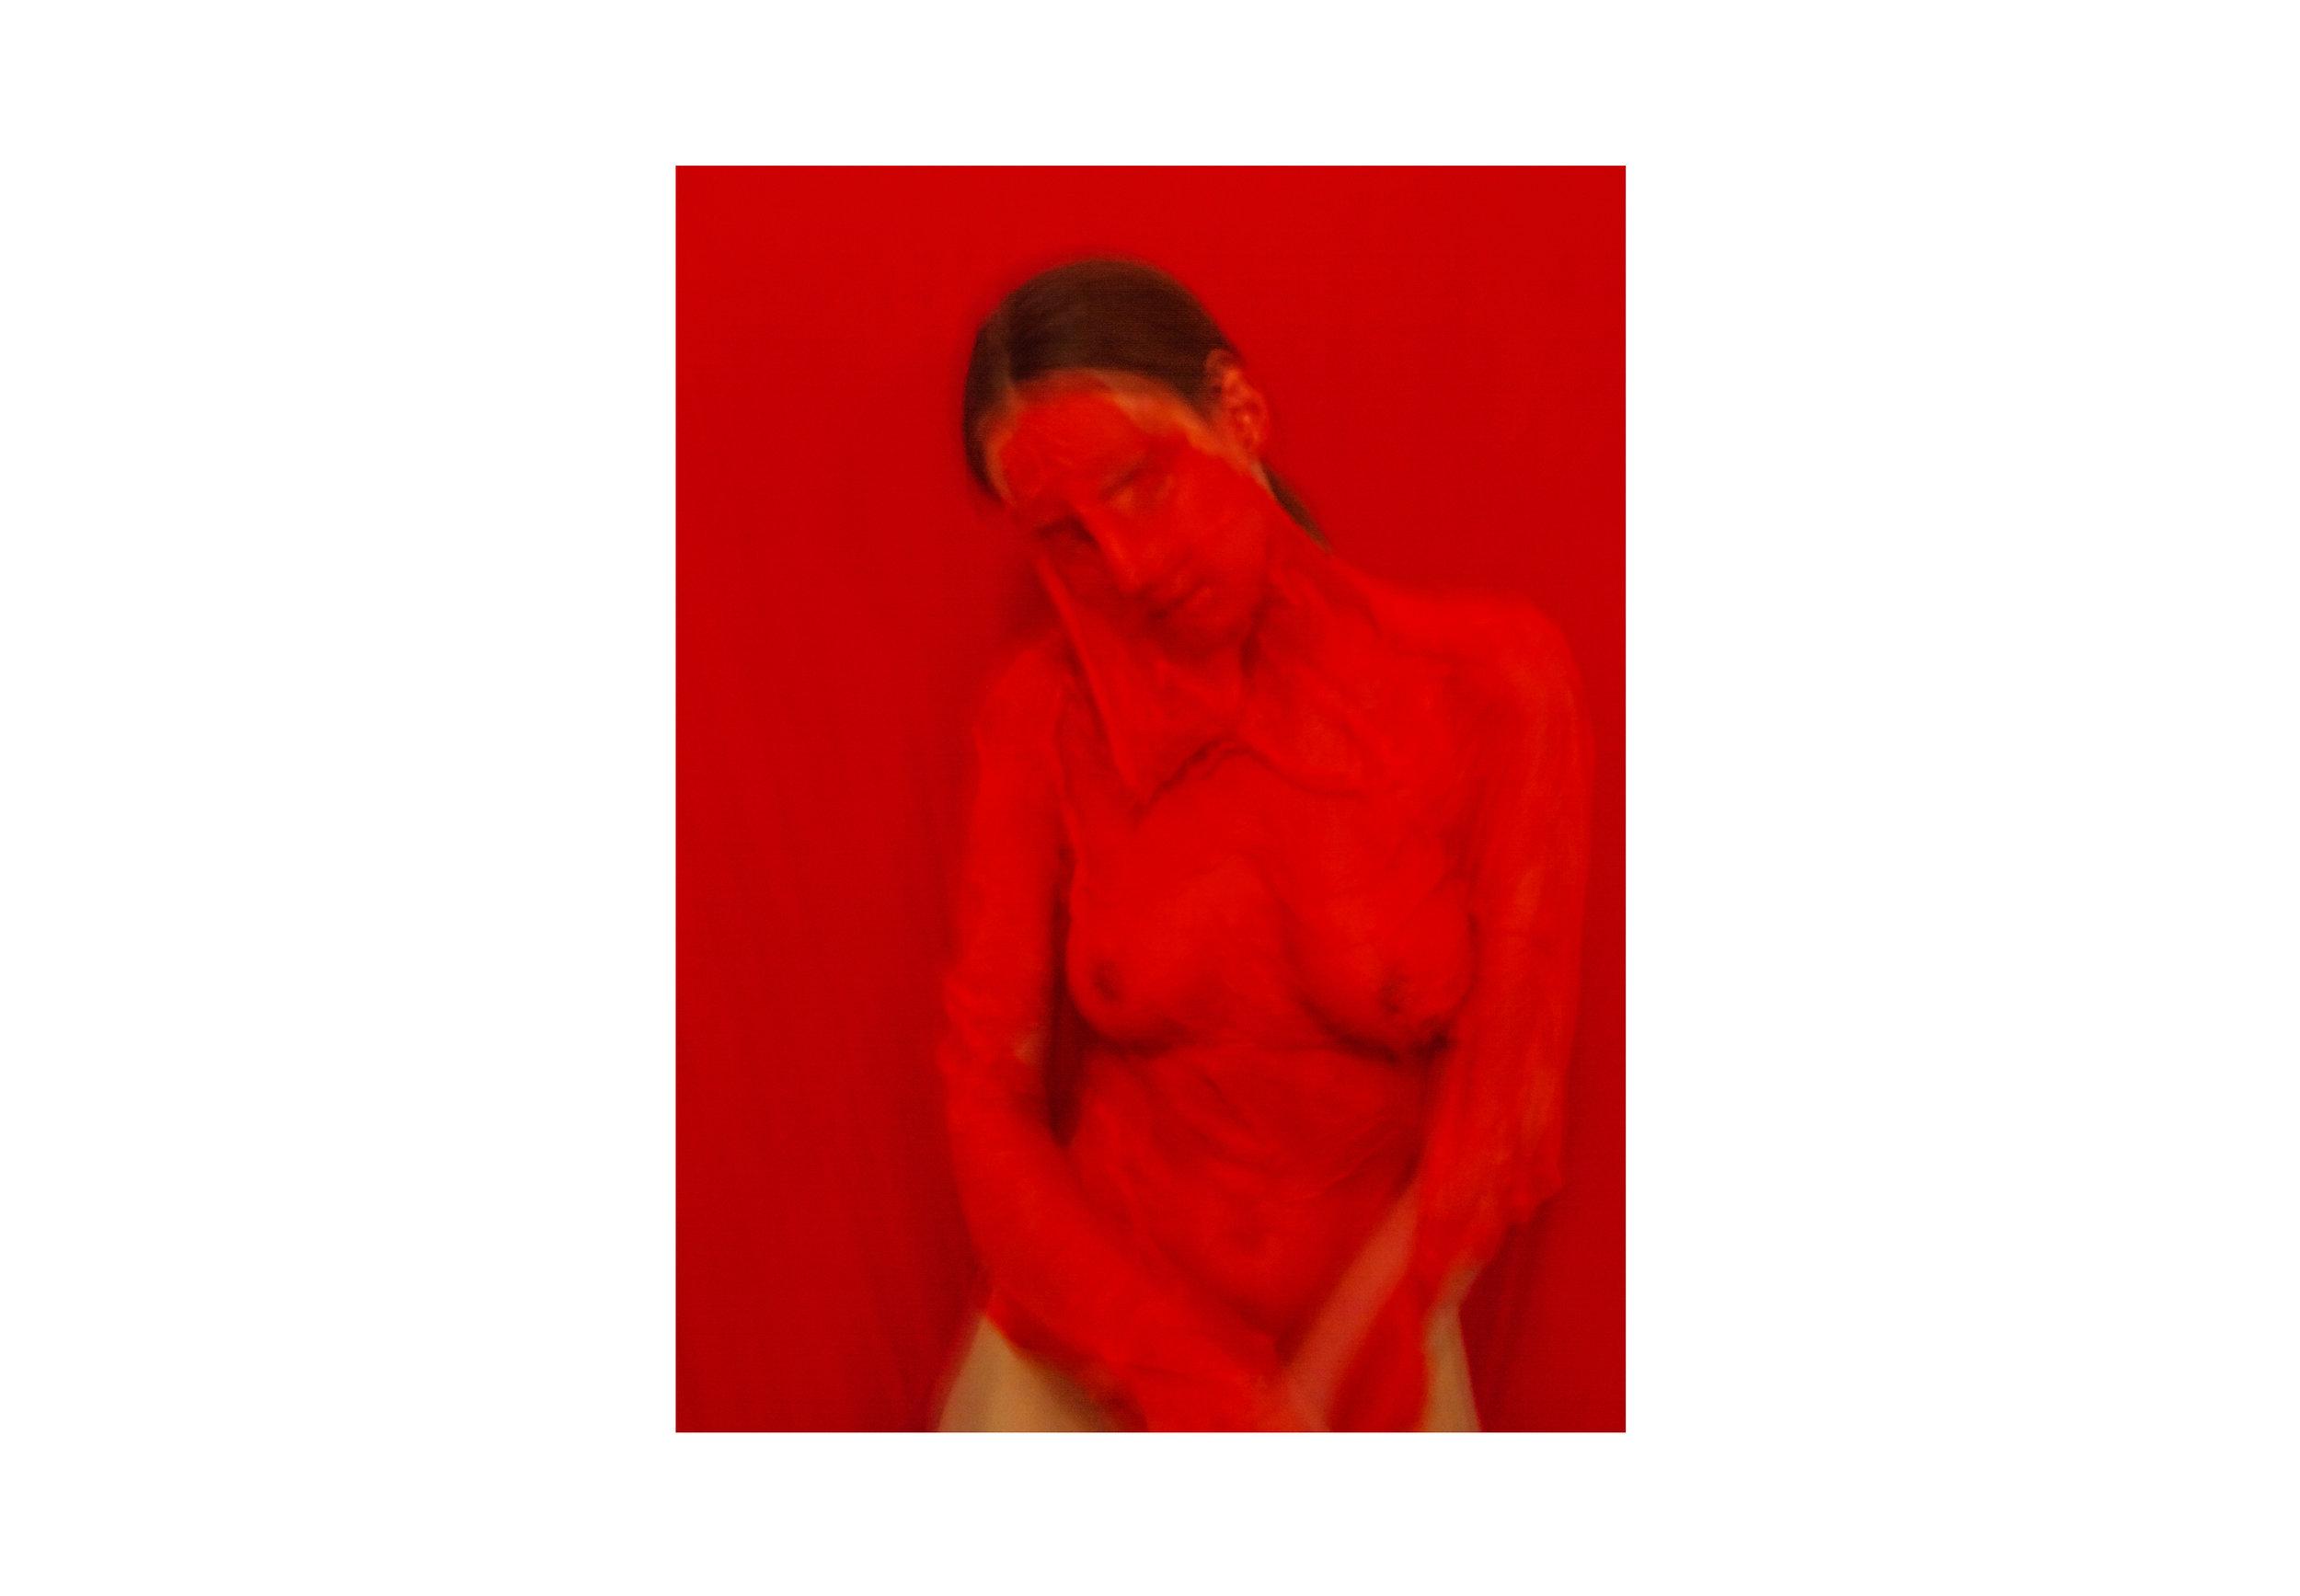 Eveline-Van-De-Griend-Collaboration-Julia-Sa-Matthew-Coleman-Photography-1.jpg